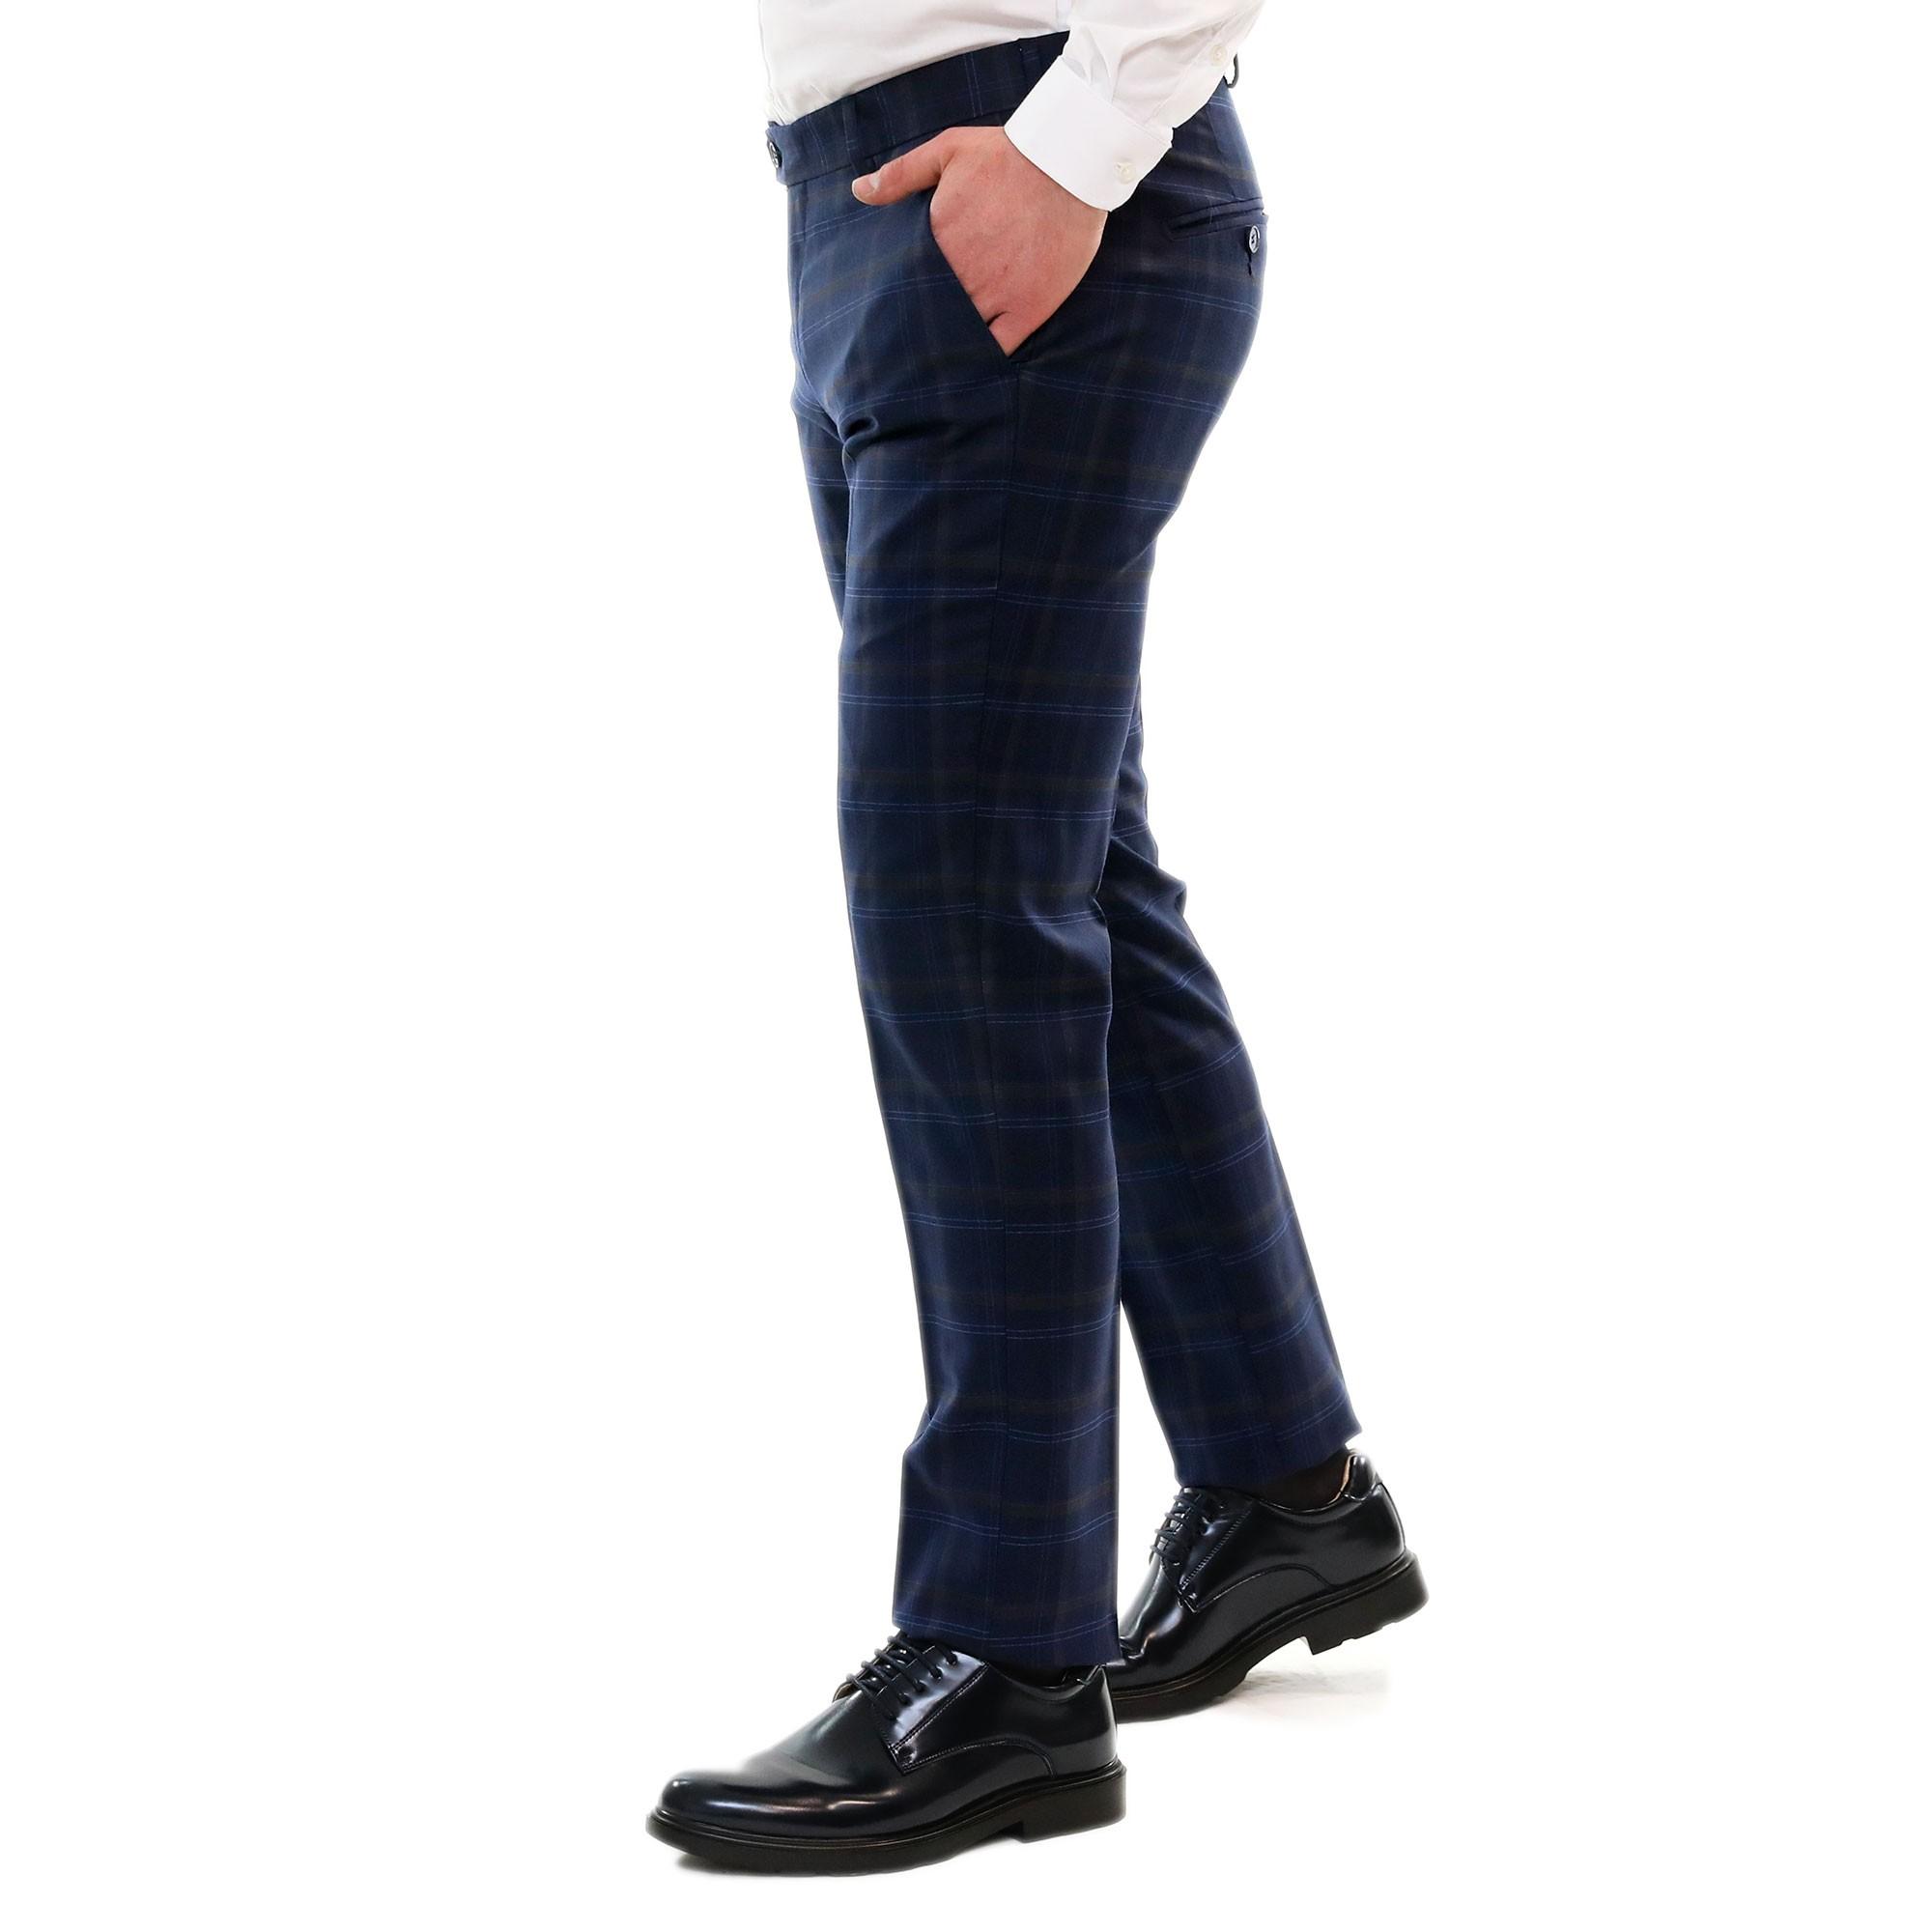 Pantaloni-Uomo-Chino-Cotone-Elegante-Estivi-Abito-Estivo-Tasca-America miniatura 3